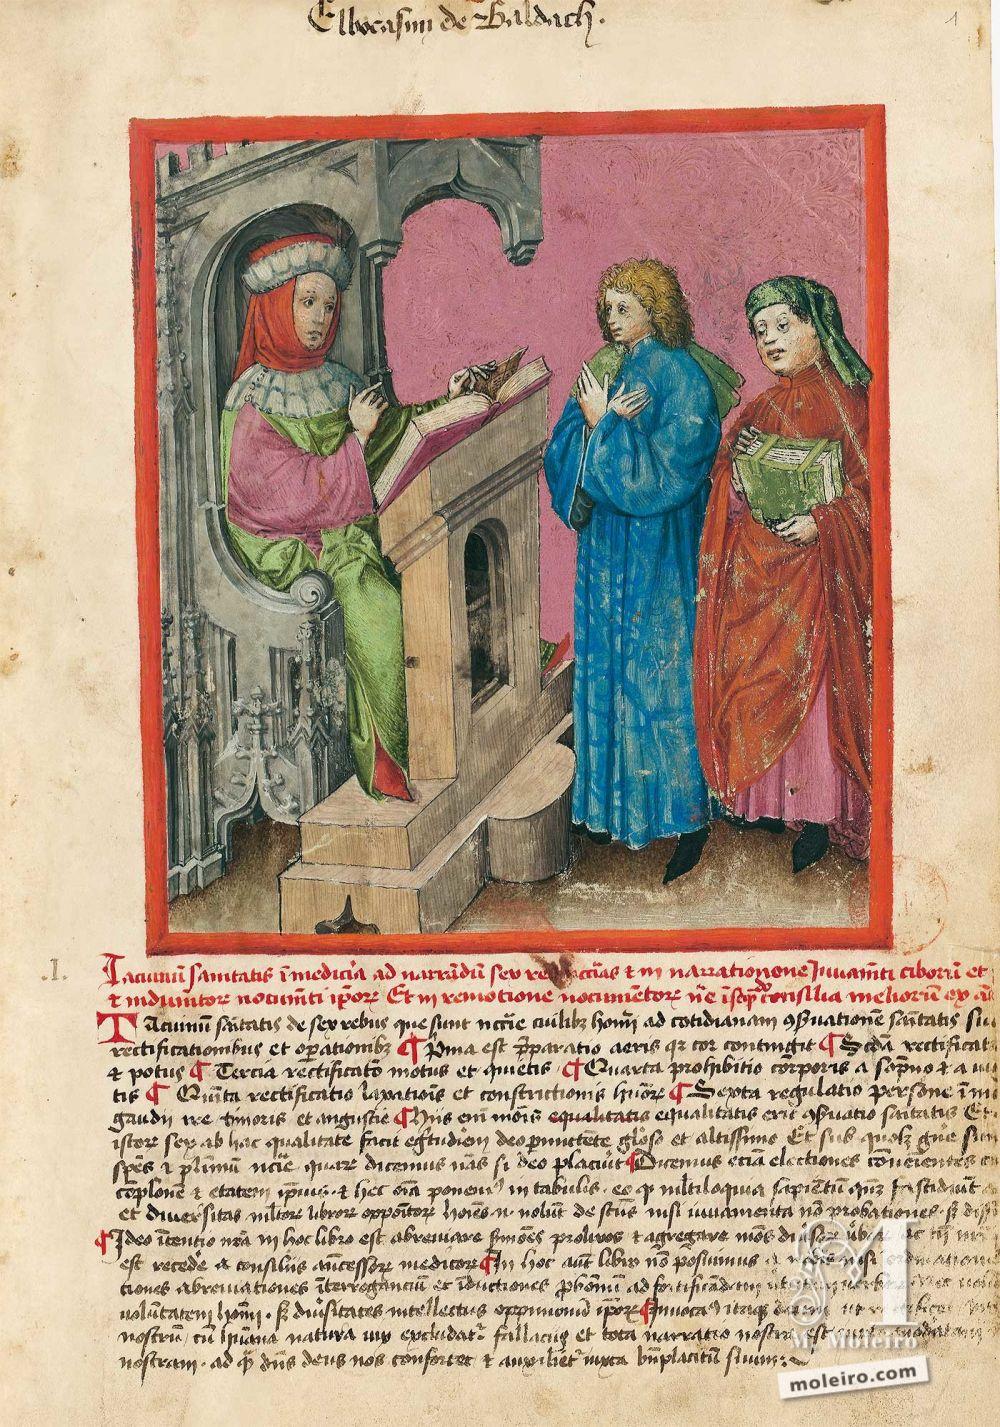 f. 1r, Elbocasim of Baldach. Tacuinum Sanitatis, Ms. Lat. 9333. Bibliothèque nationale de France, Parigi